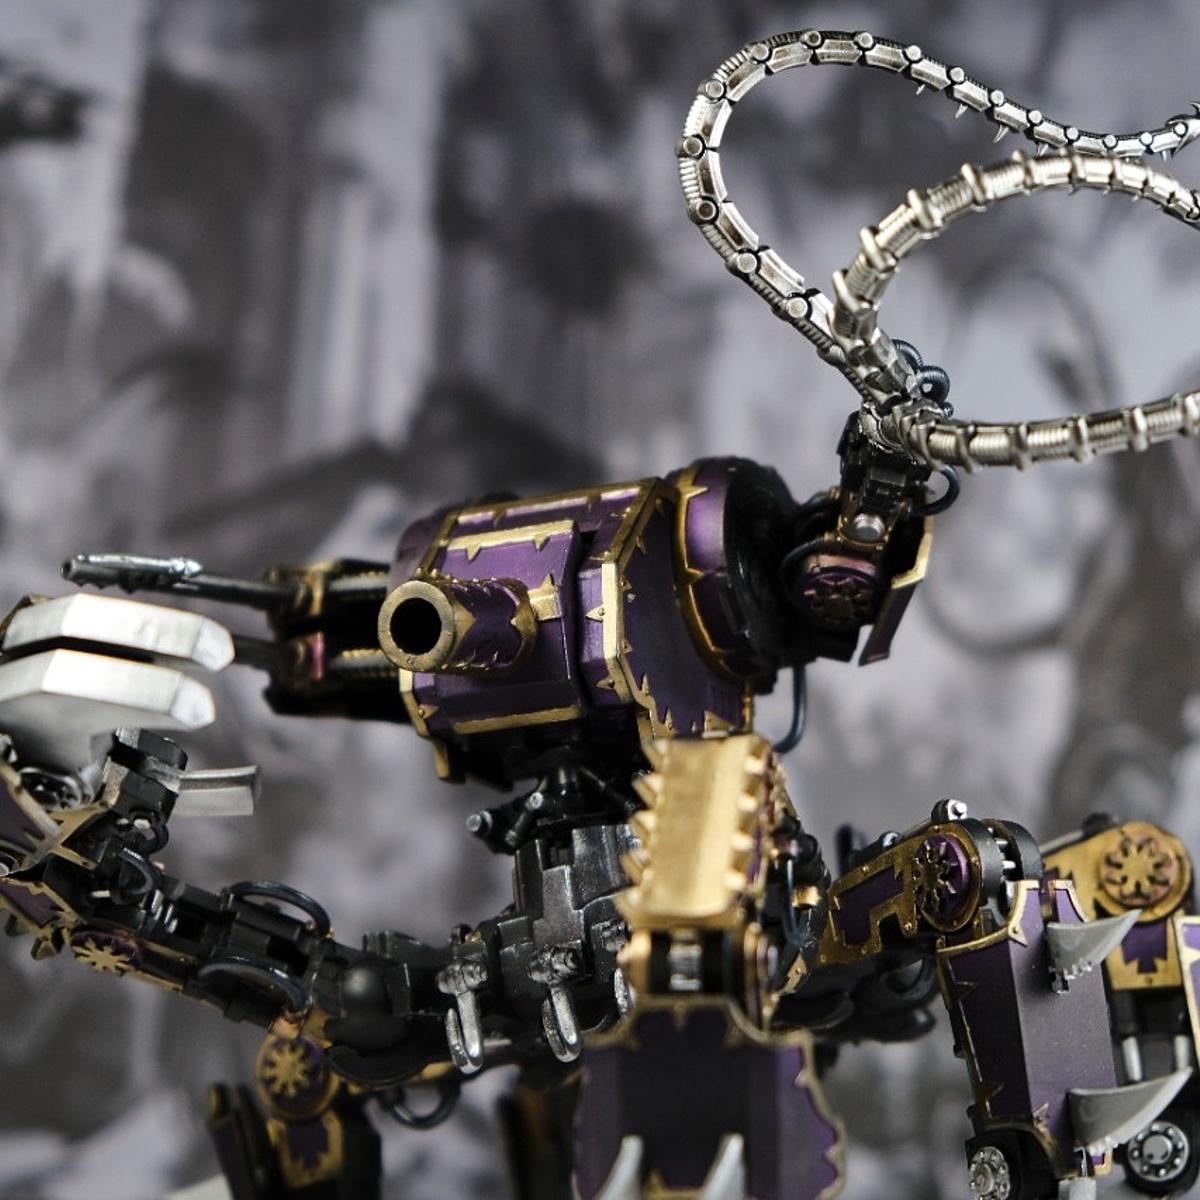 Purple and Brass Defiler